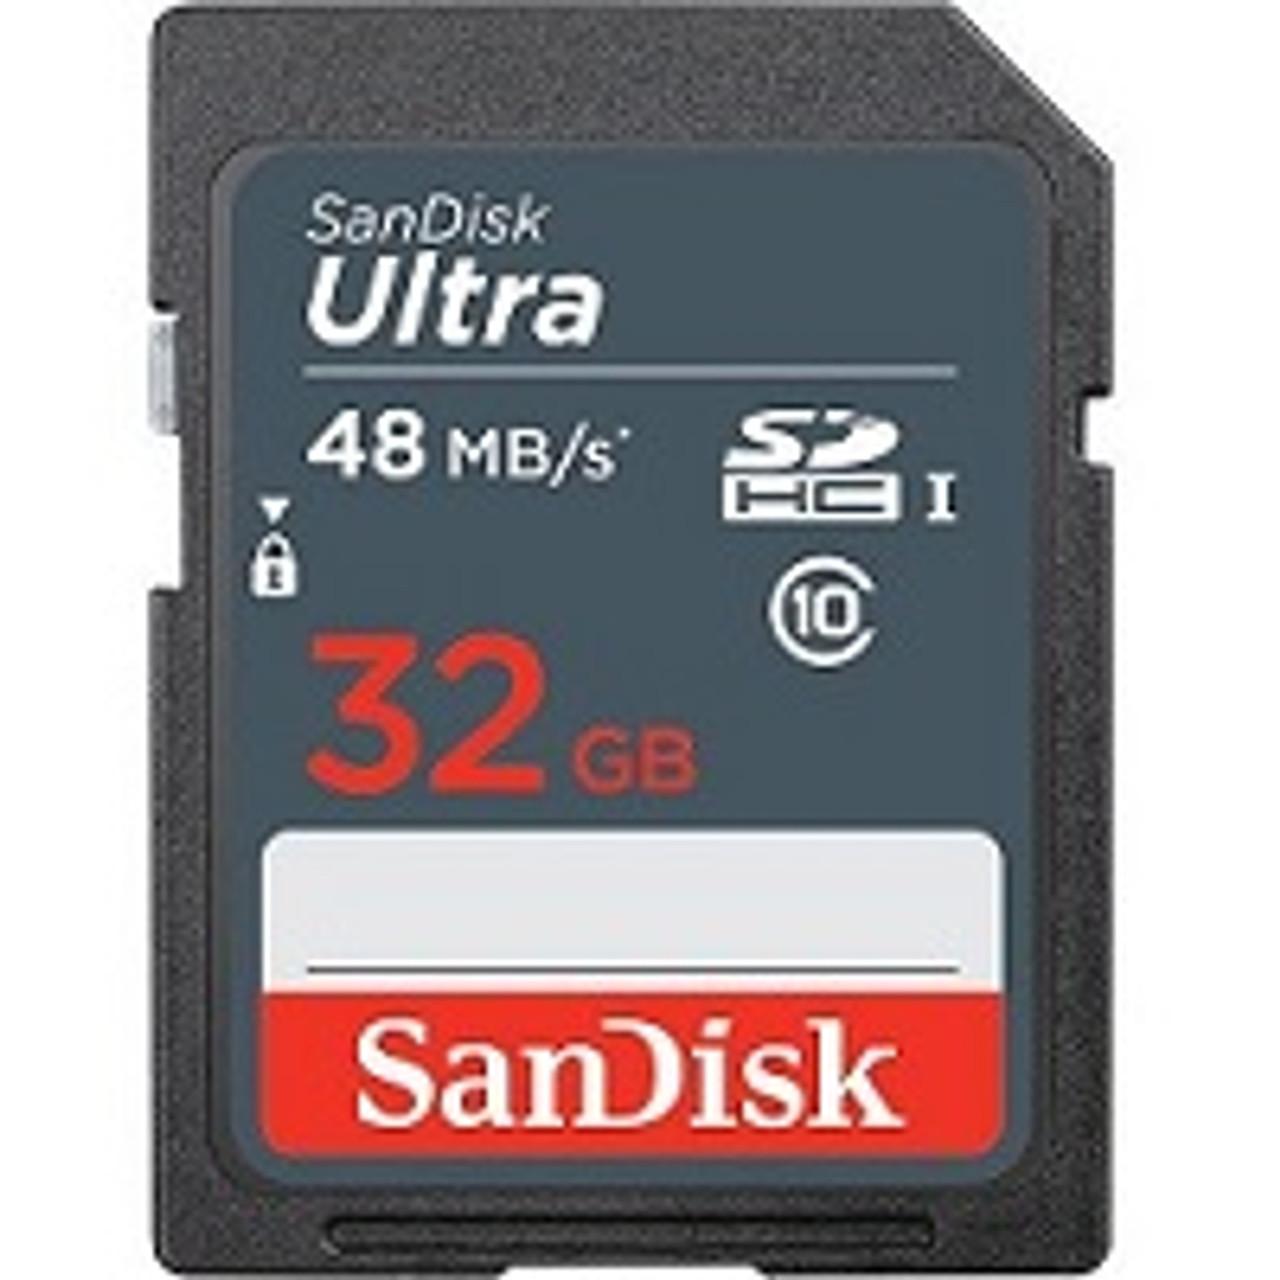 32GB Sandisk Ultra Card Included in Spartan GoCam Package